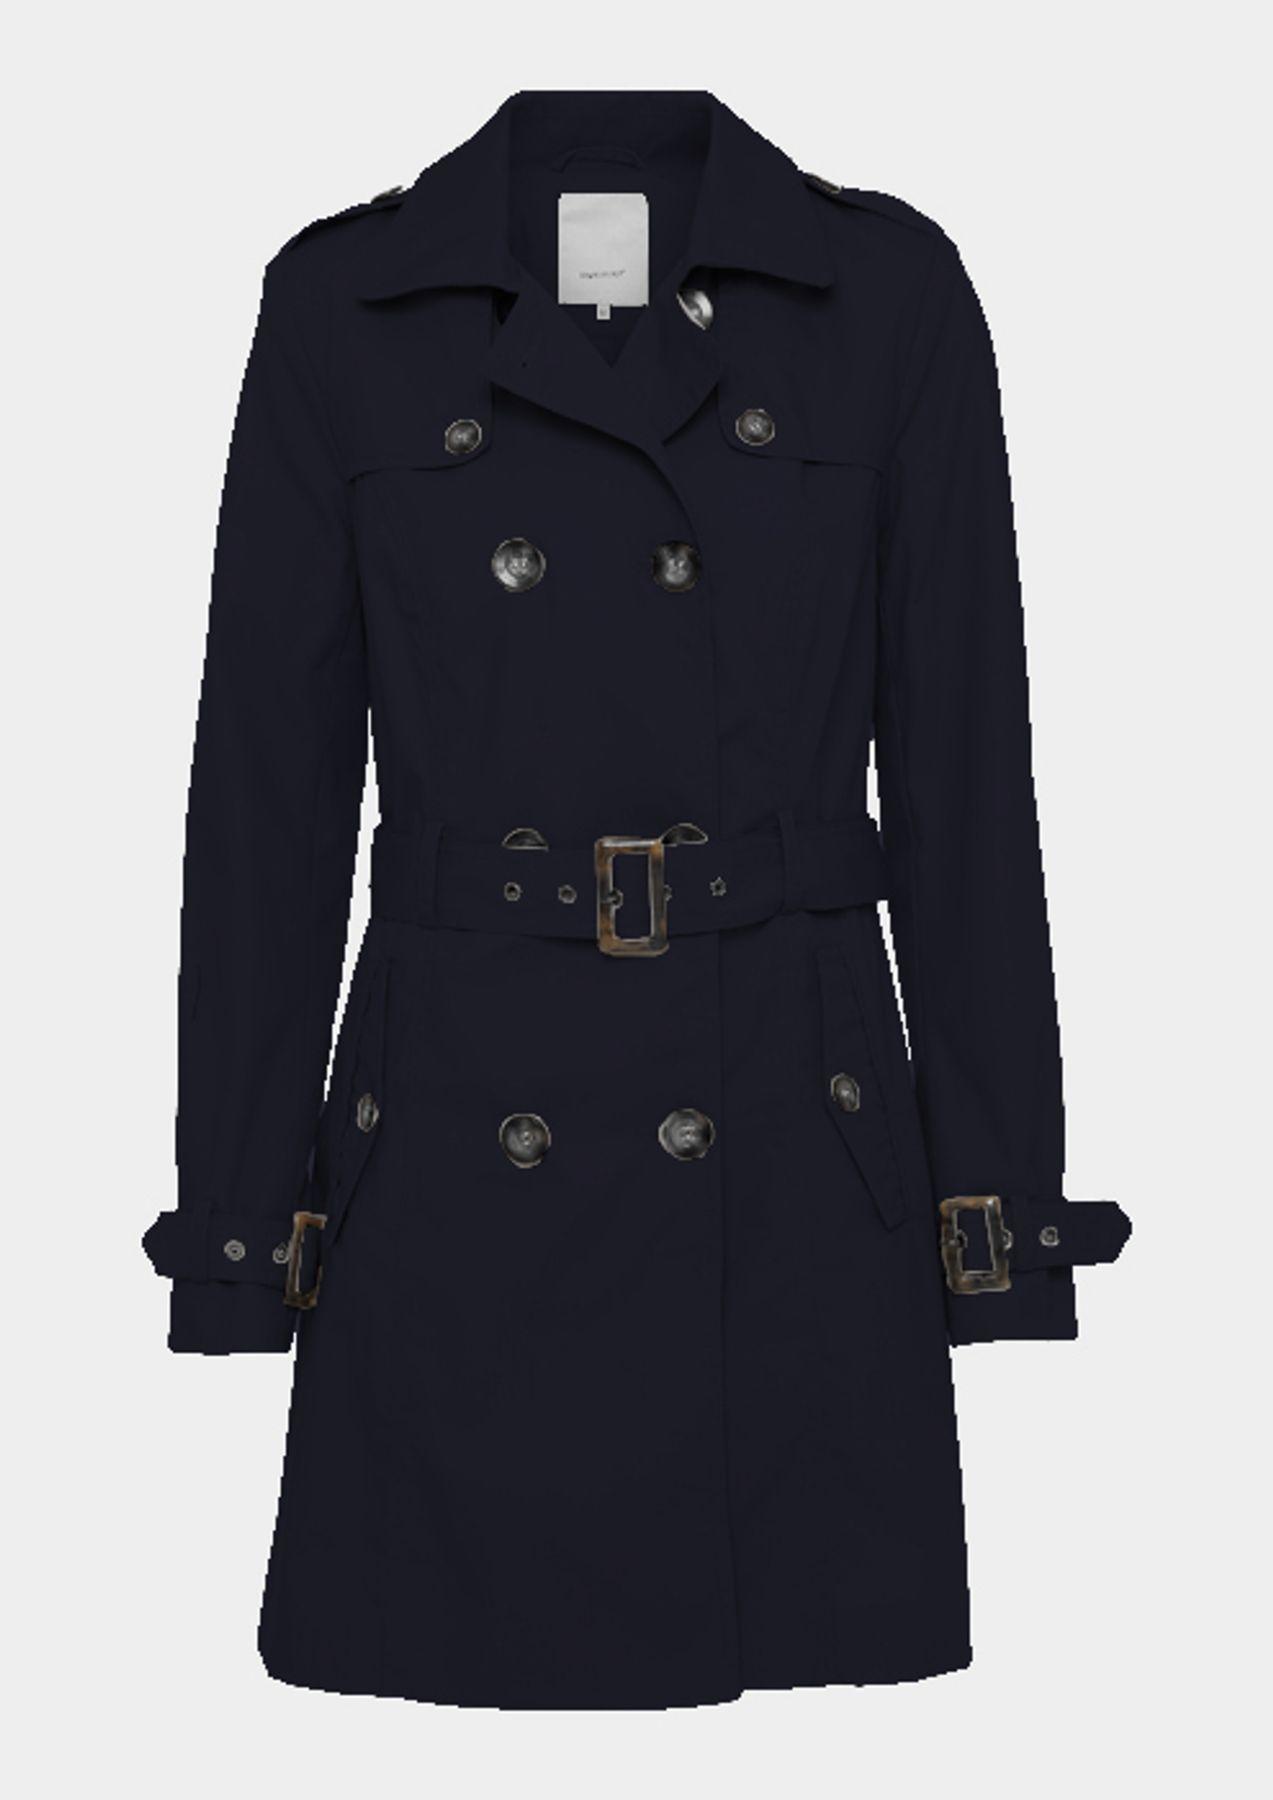 Soyaconcept - Damen Mantel / Trenchcoat in  beige oder blau, SC-Lora 2 (15427-30)